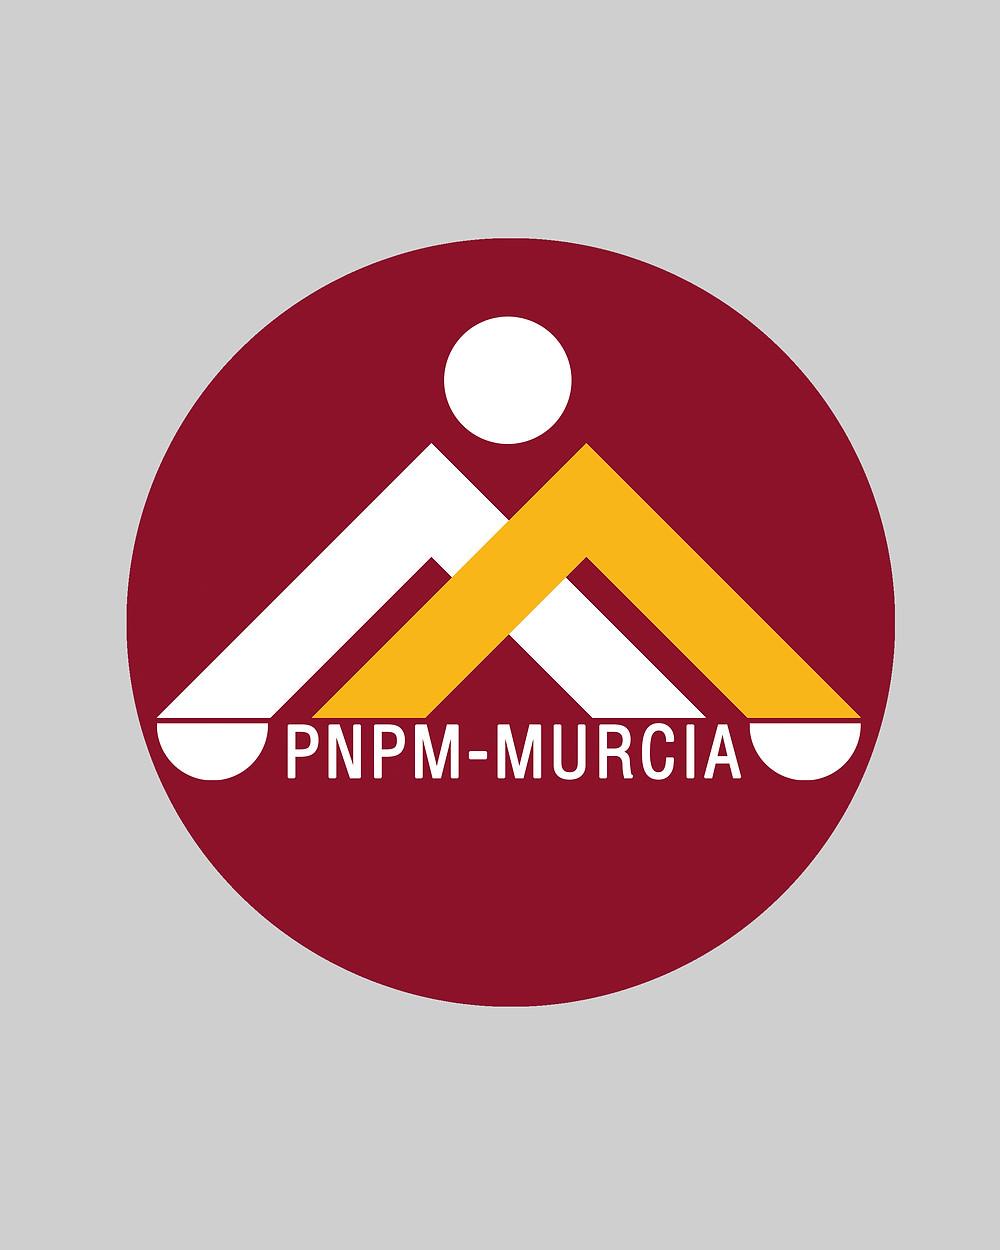 PNPMM.jpg